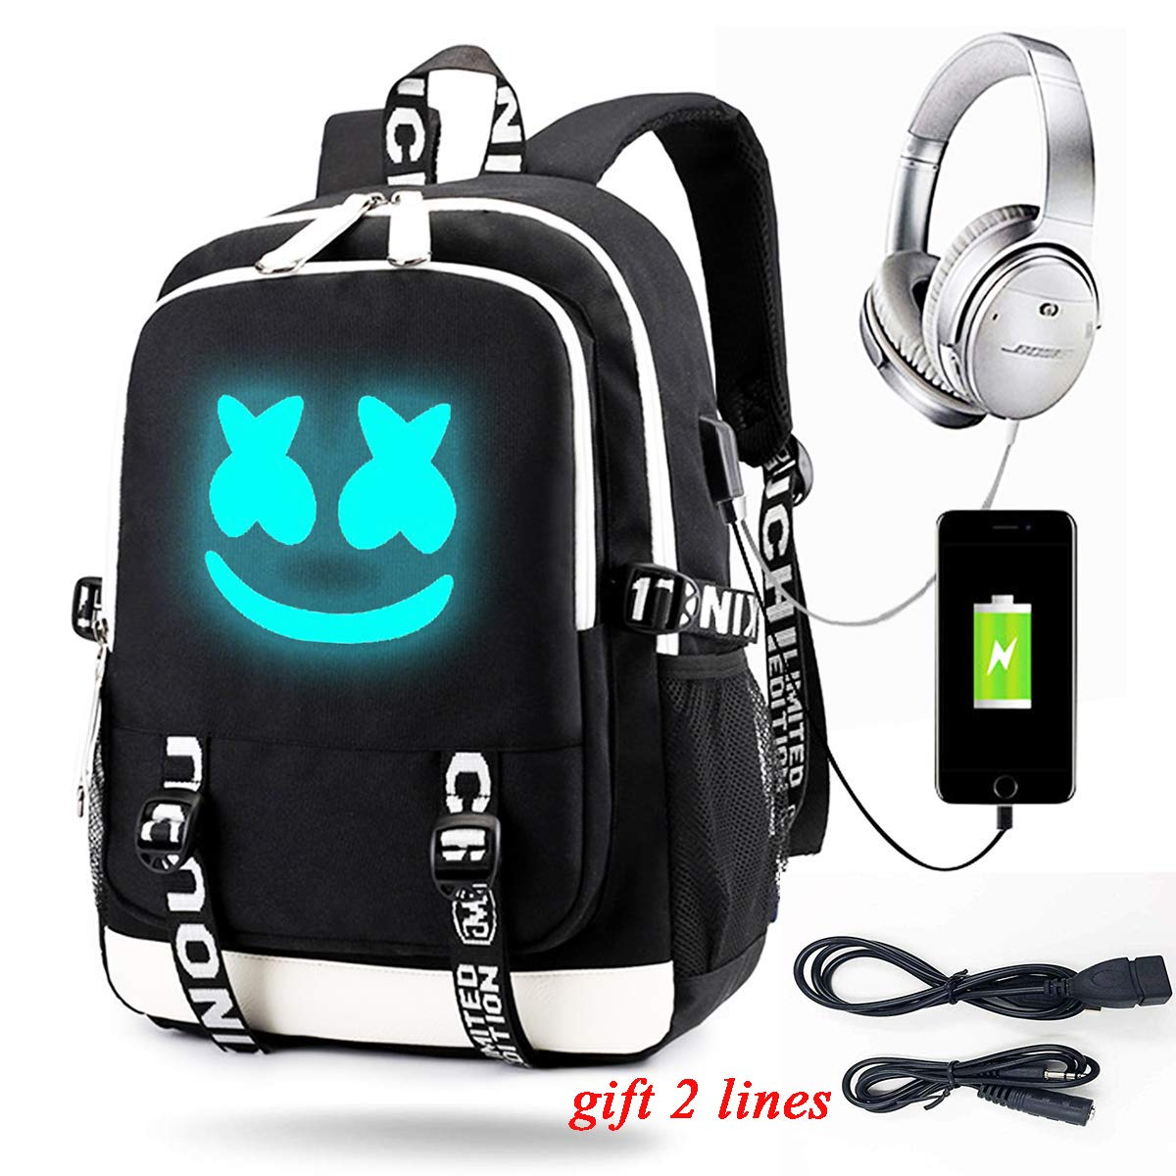 Luminous Backpack with USB Charging Port Fashion Travel Laptop Daypack Unisex Bookbag Student School Bag Rucksack